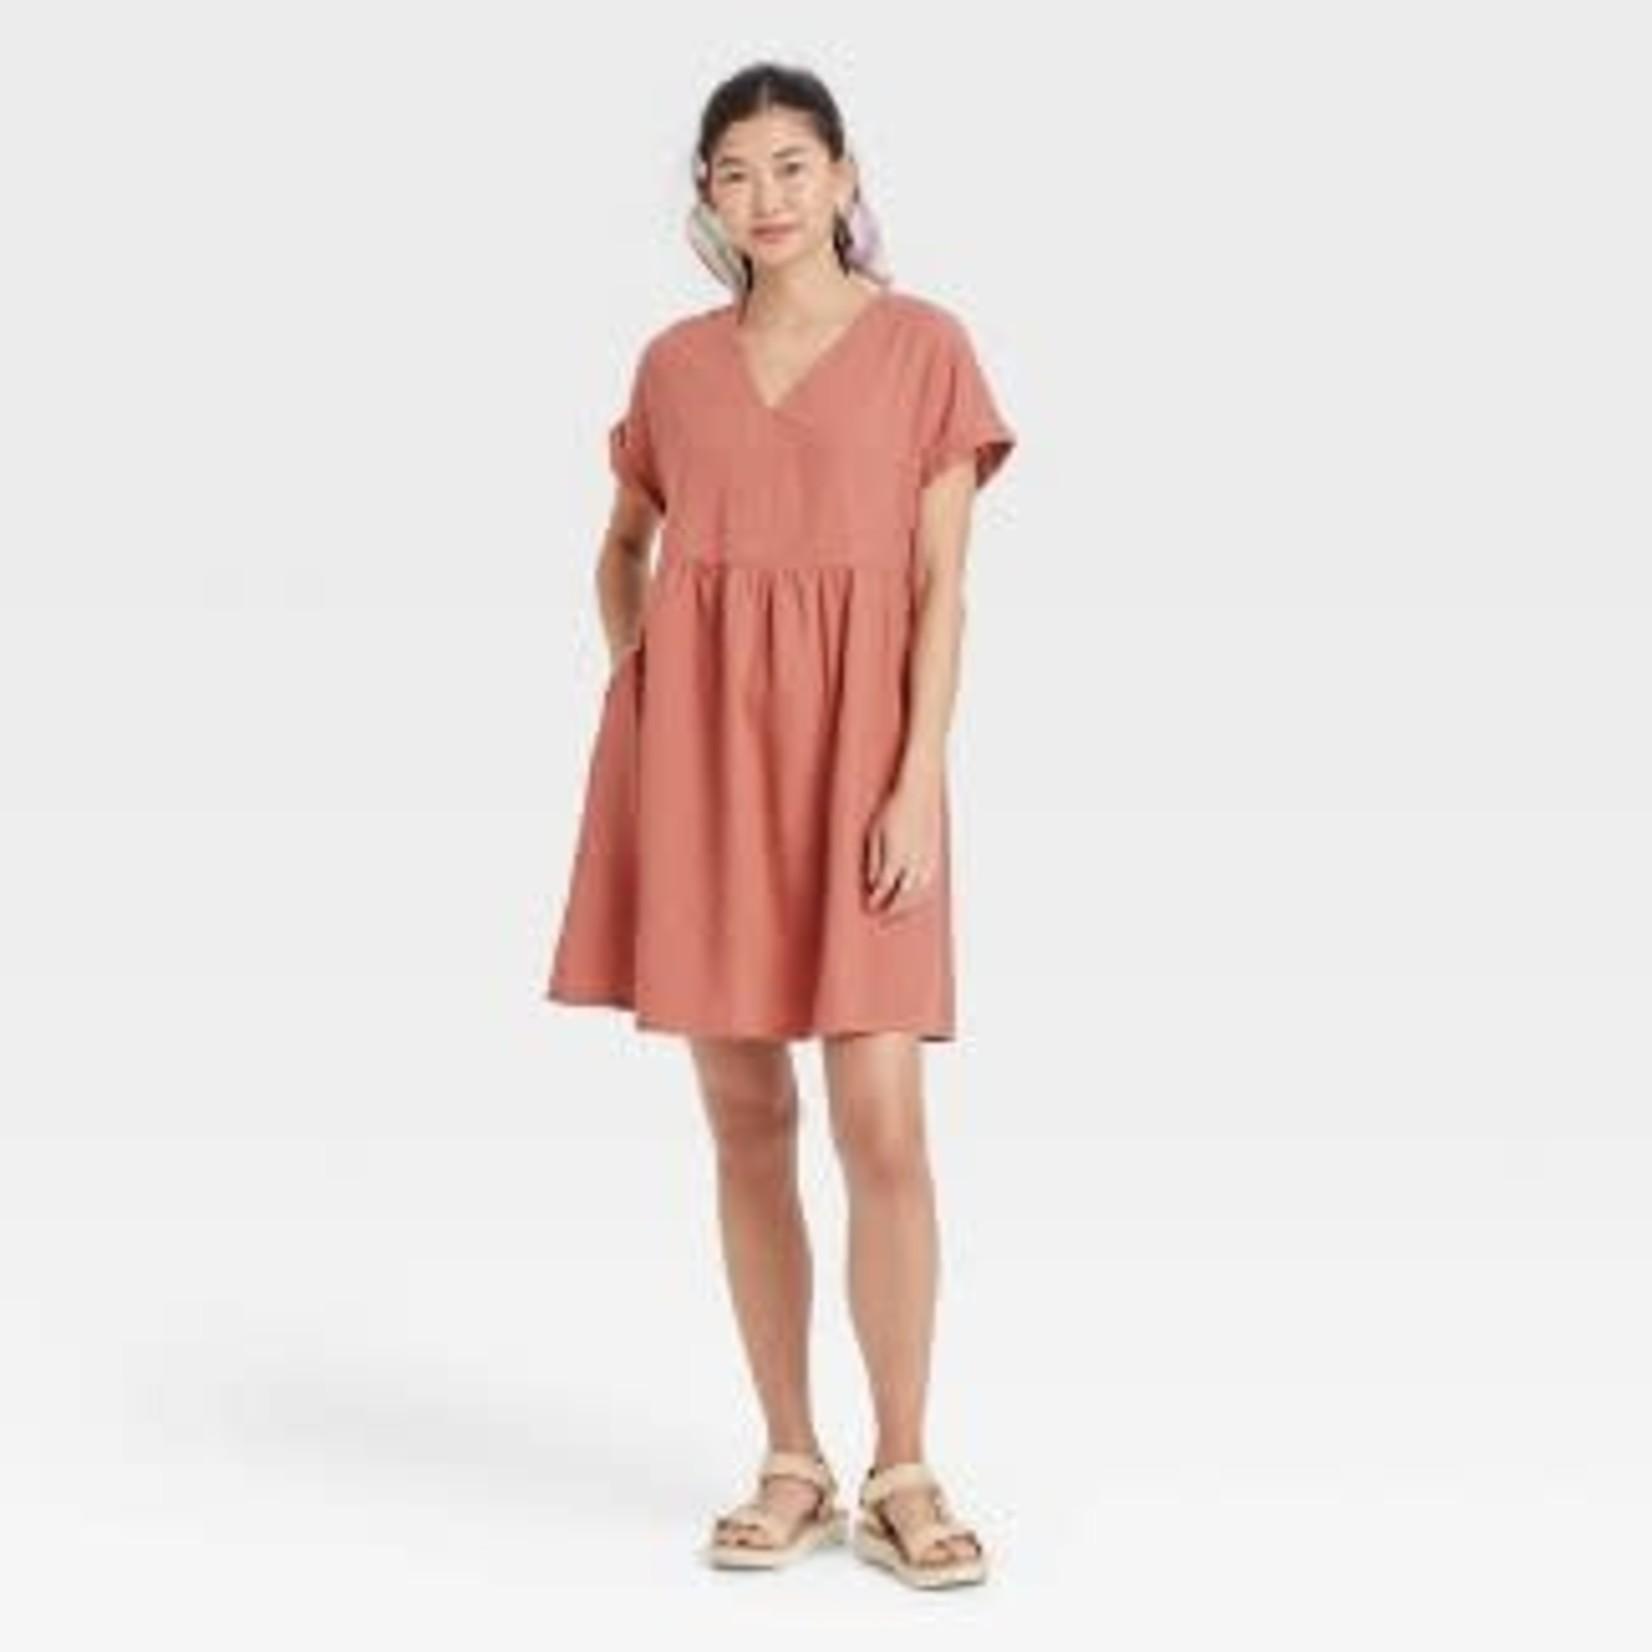 Women's Short Sleeve Shirtdress-Blush Pink -XS, S